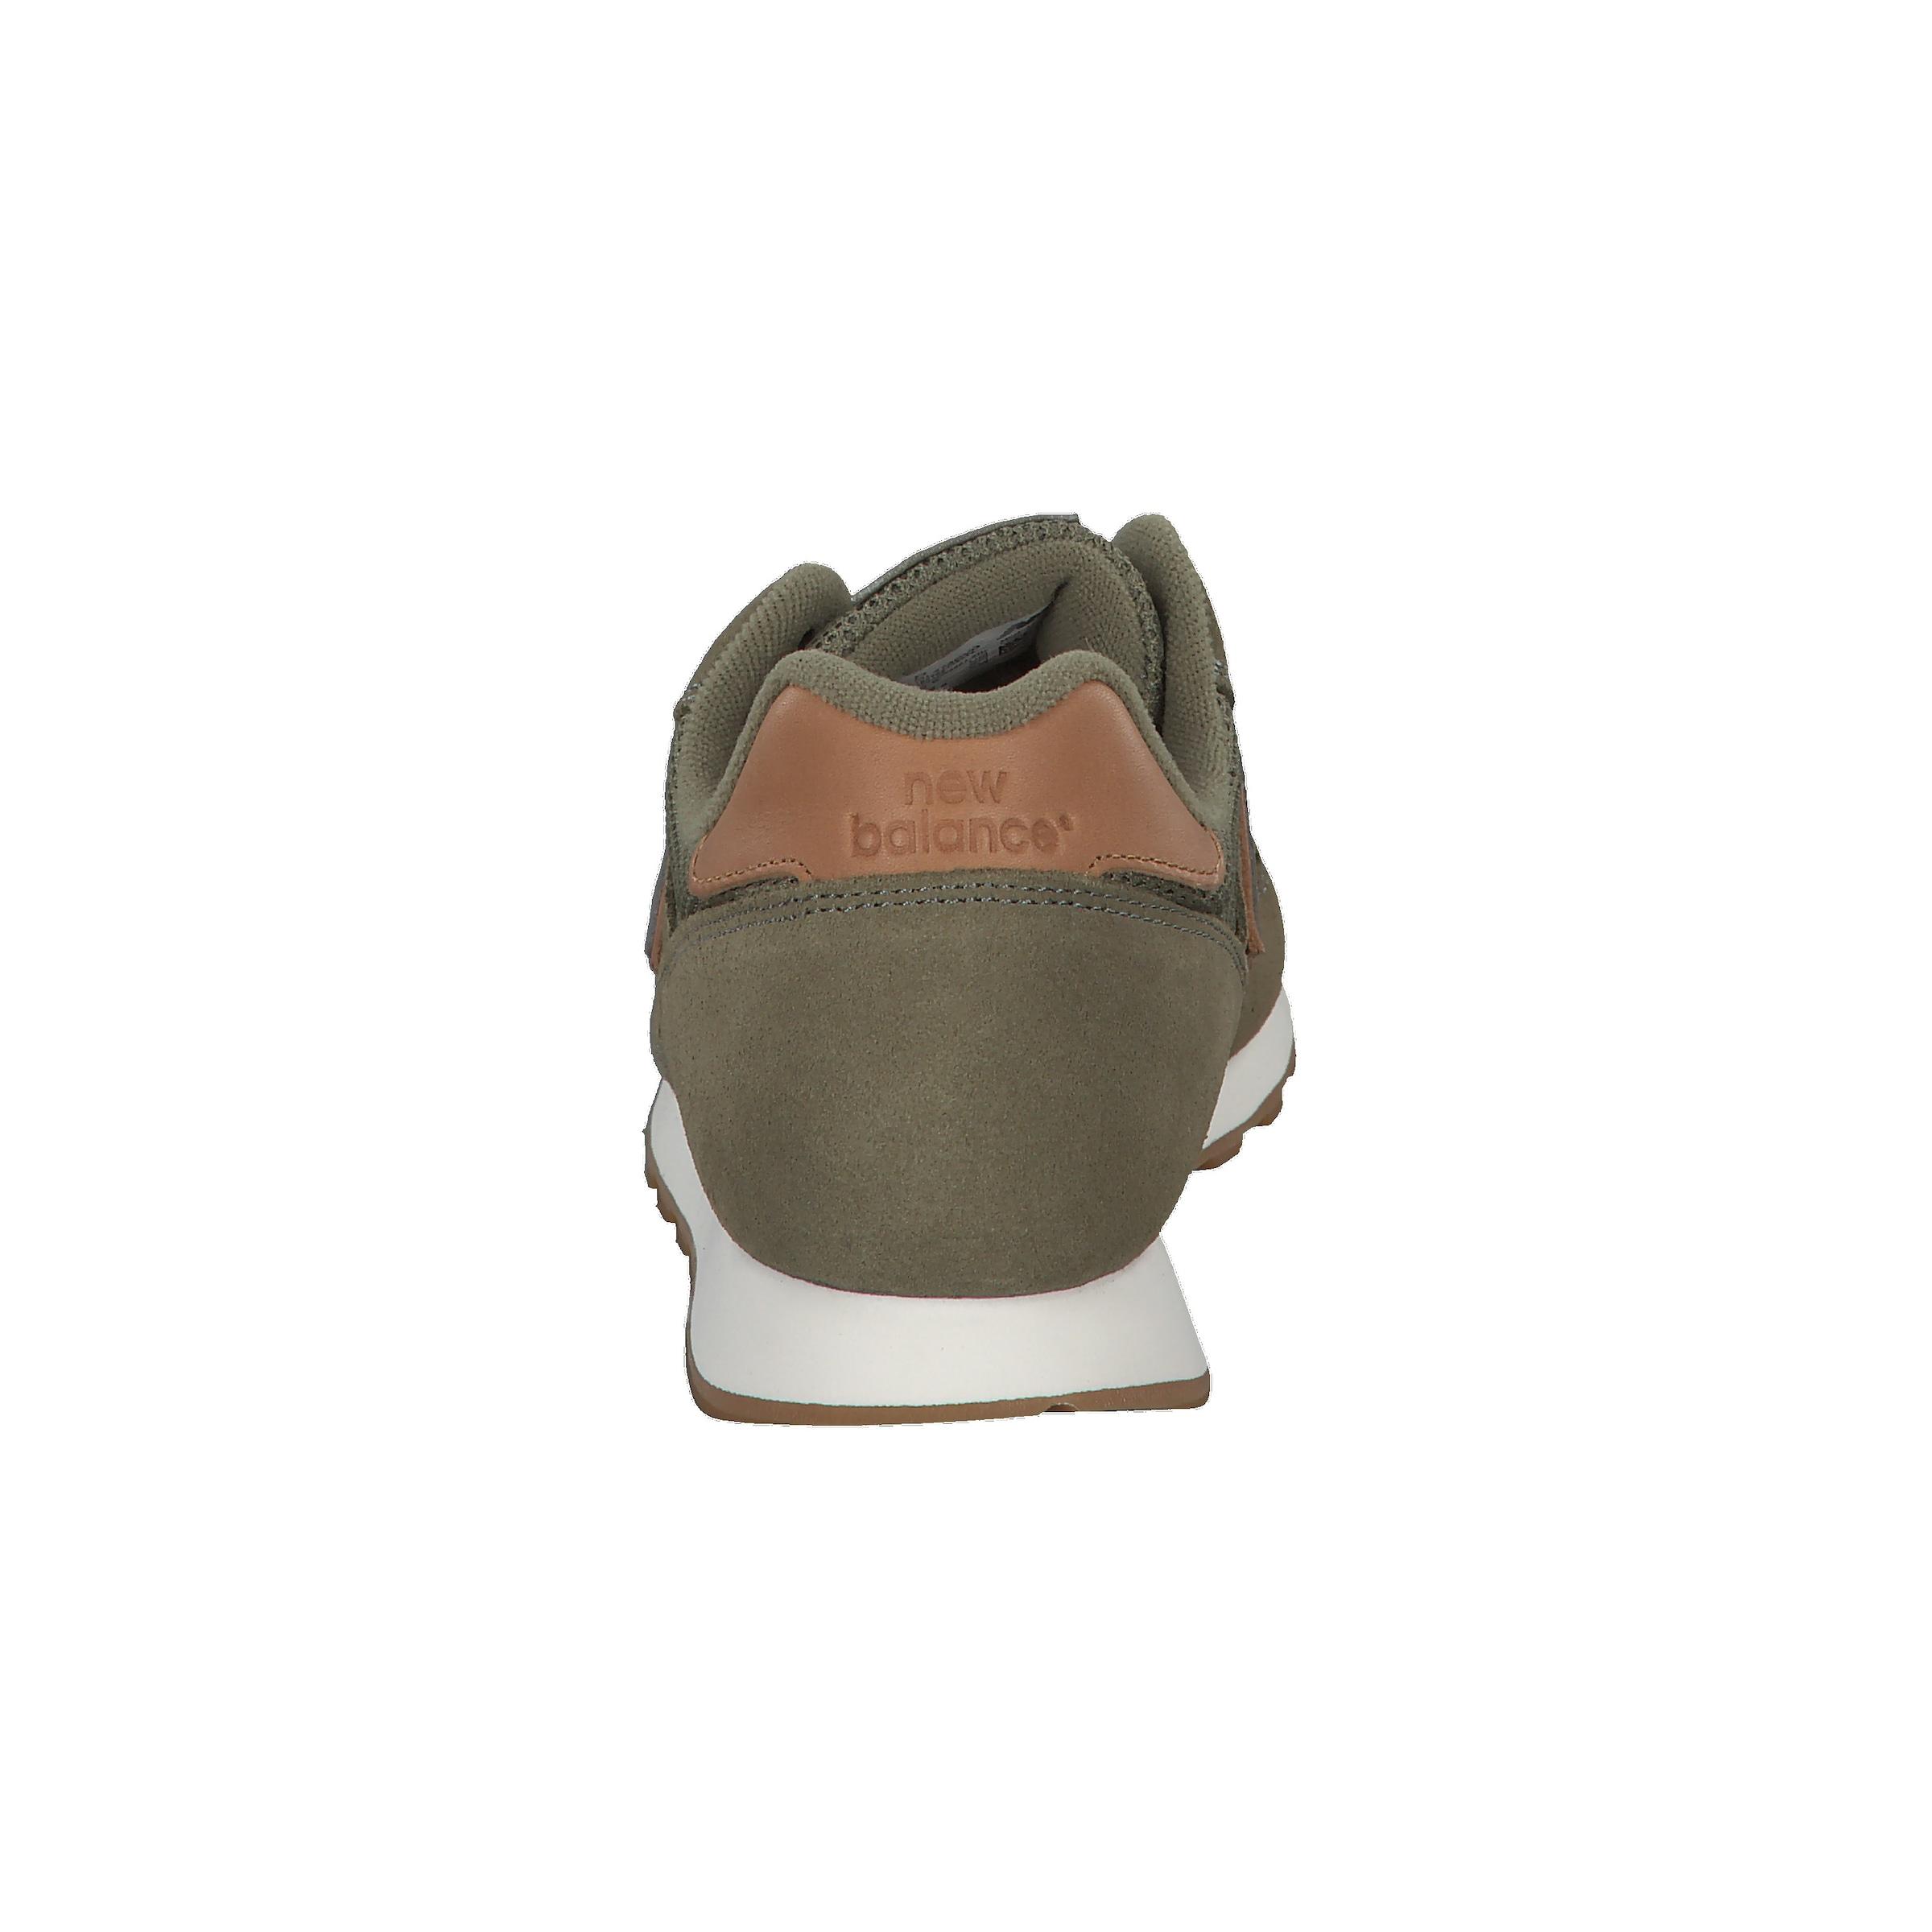 BraunKhaki Balance Weiß Sneaker In New mvN08wn